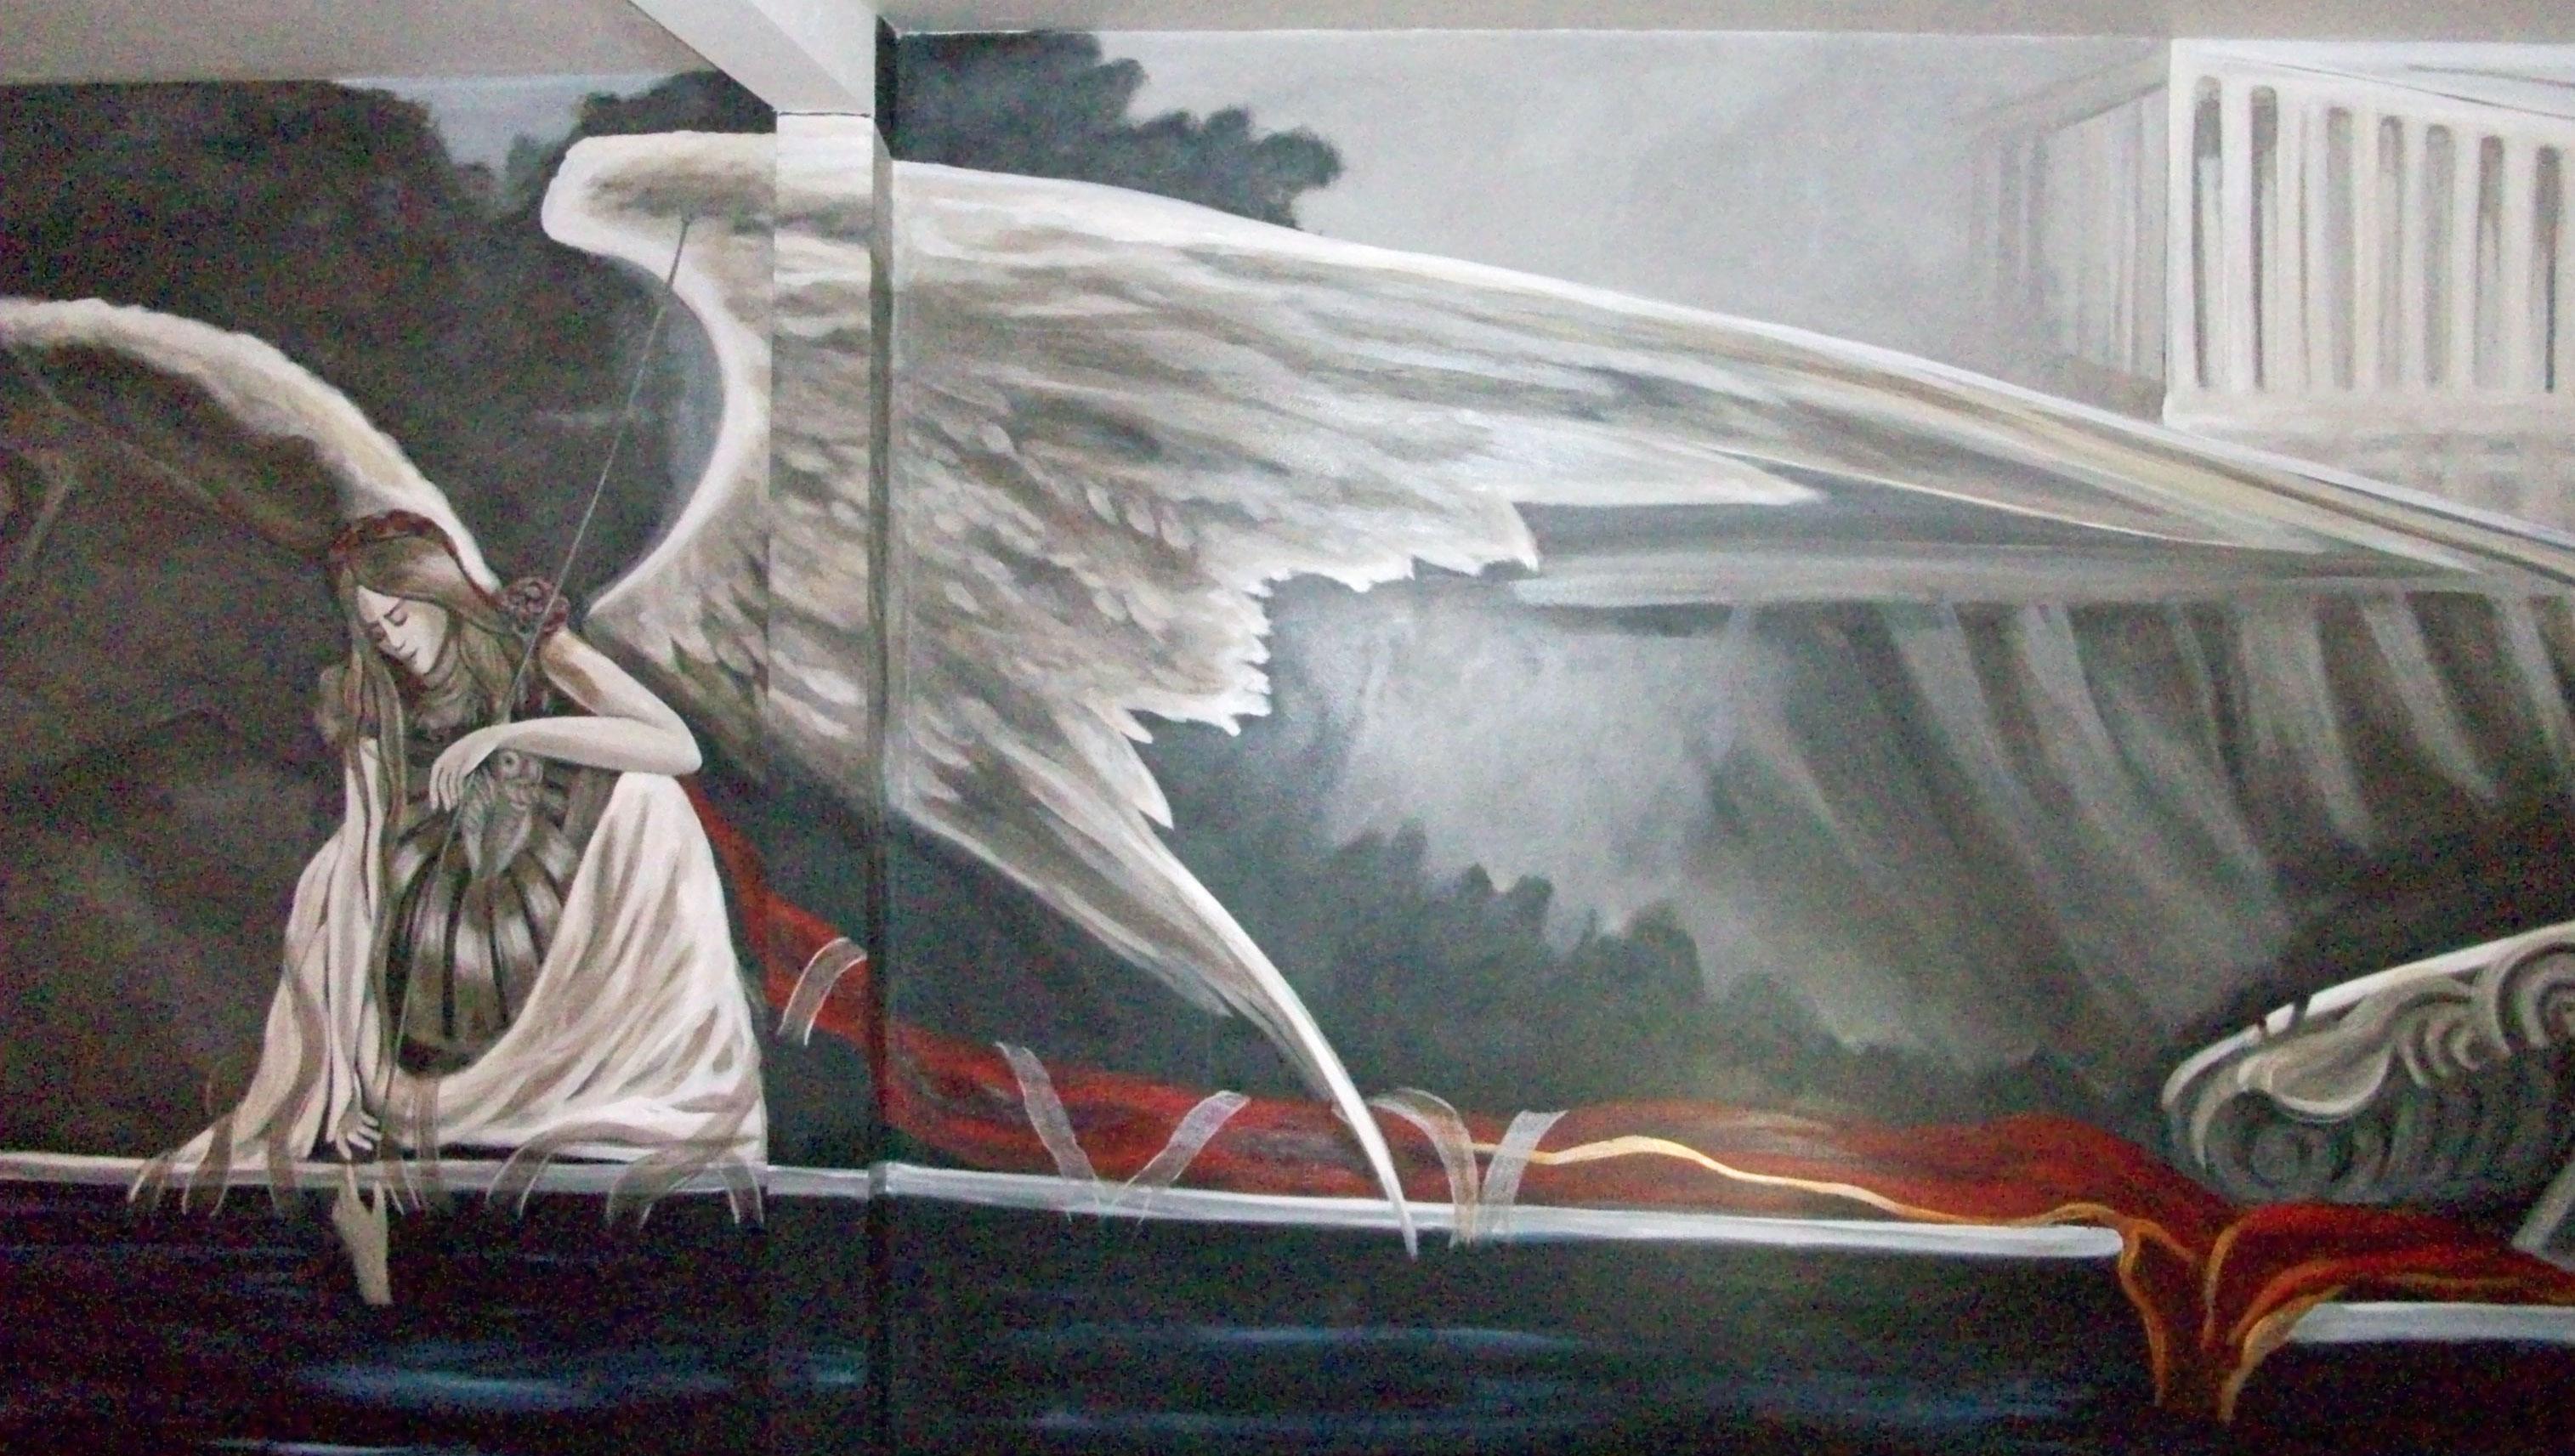 angelmural7